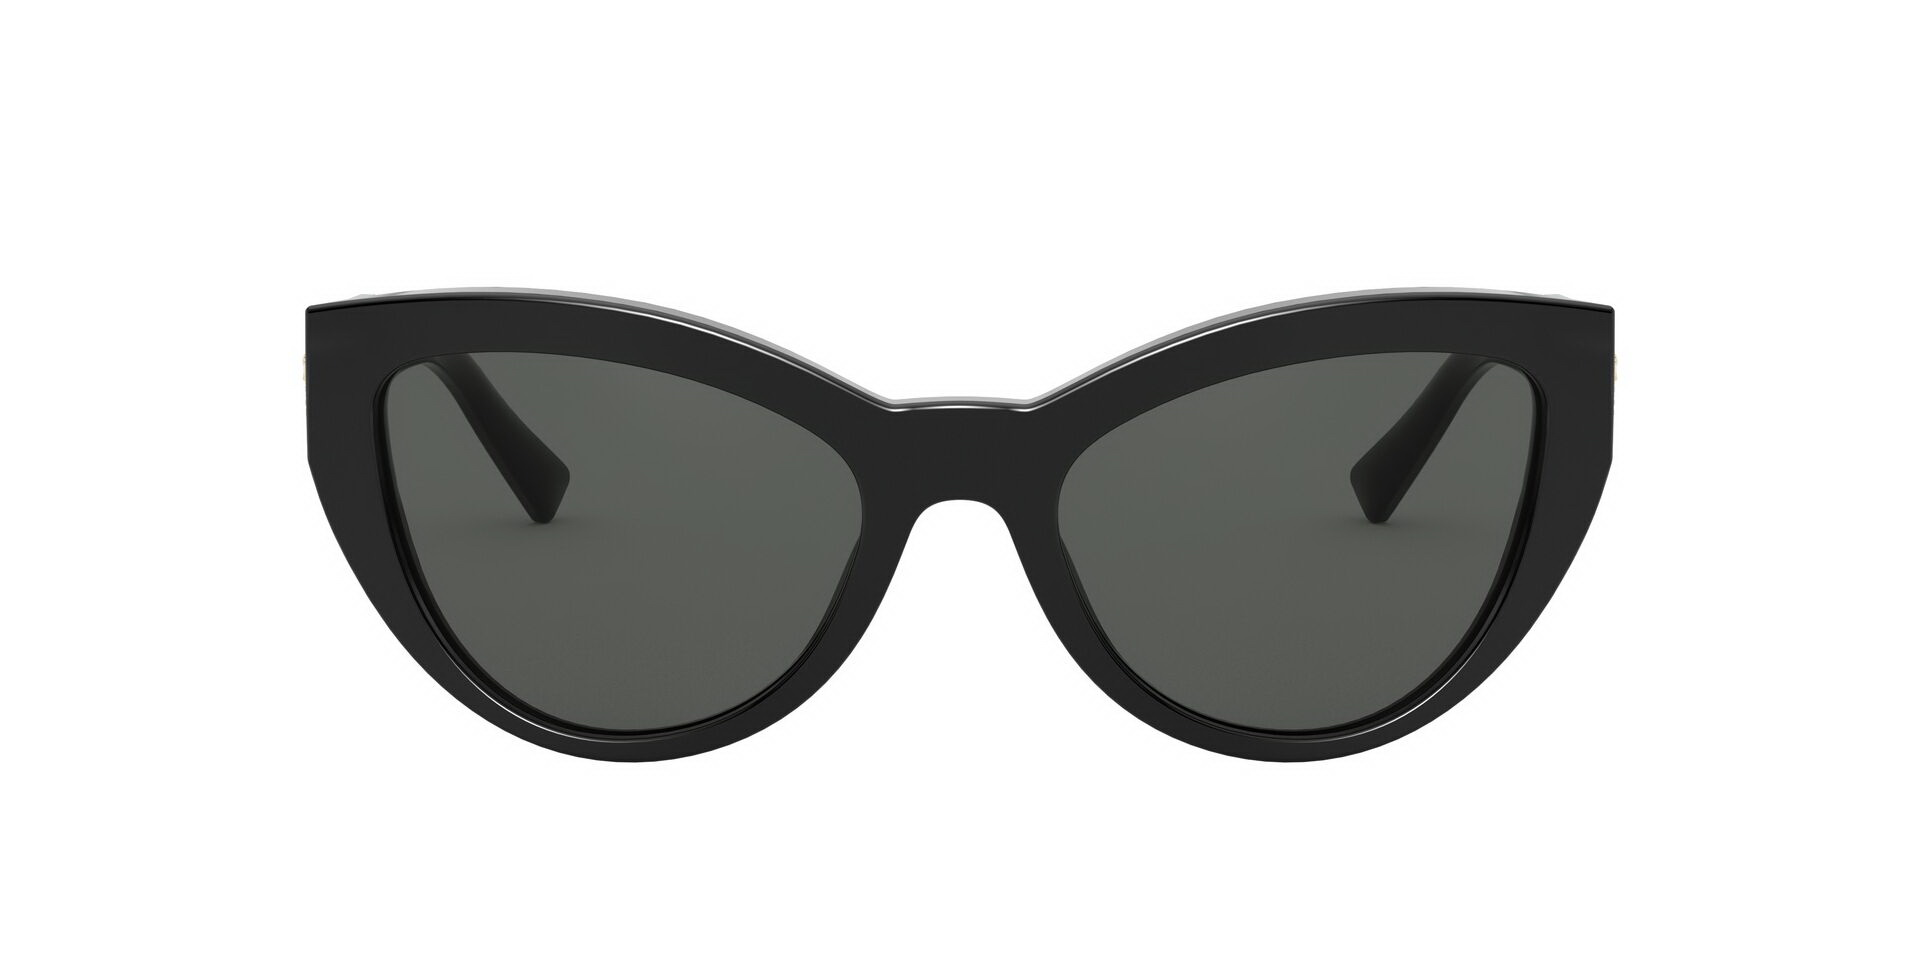 Солнцезащитные очки Очки с/з VERSACE 0VE4381B GB1/87 фото